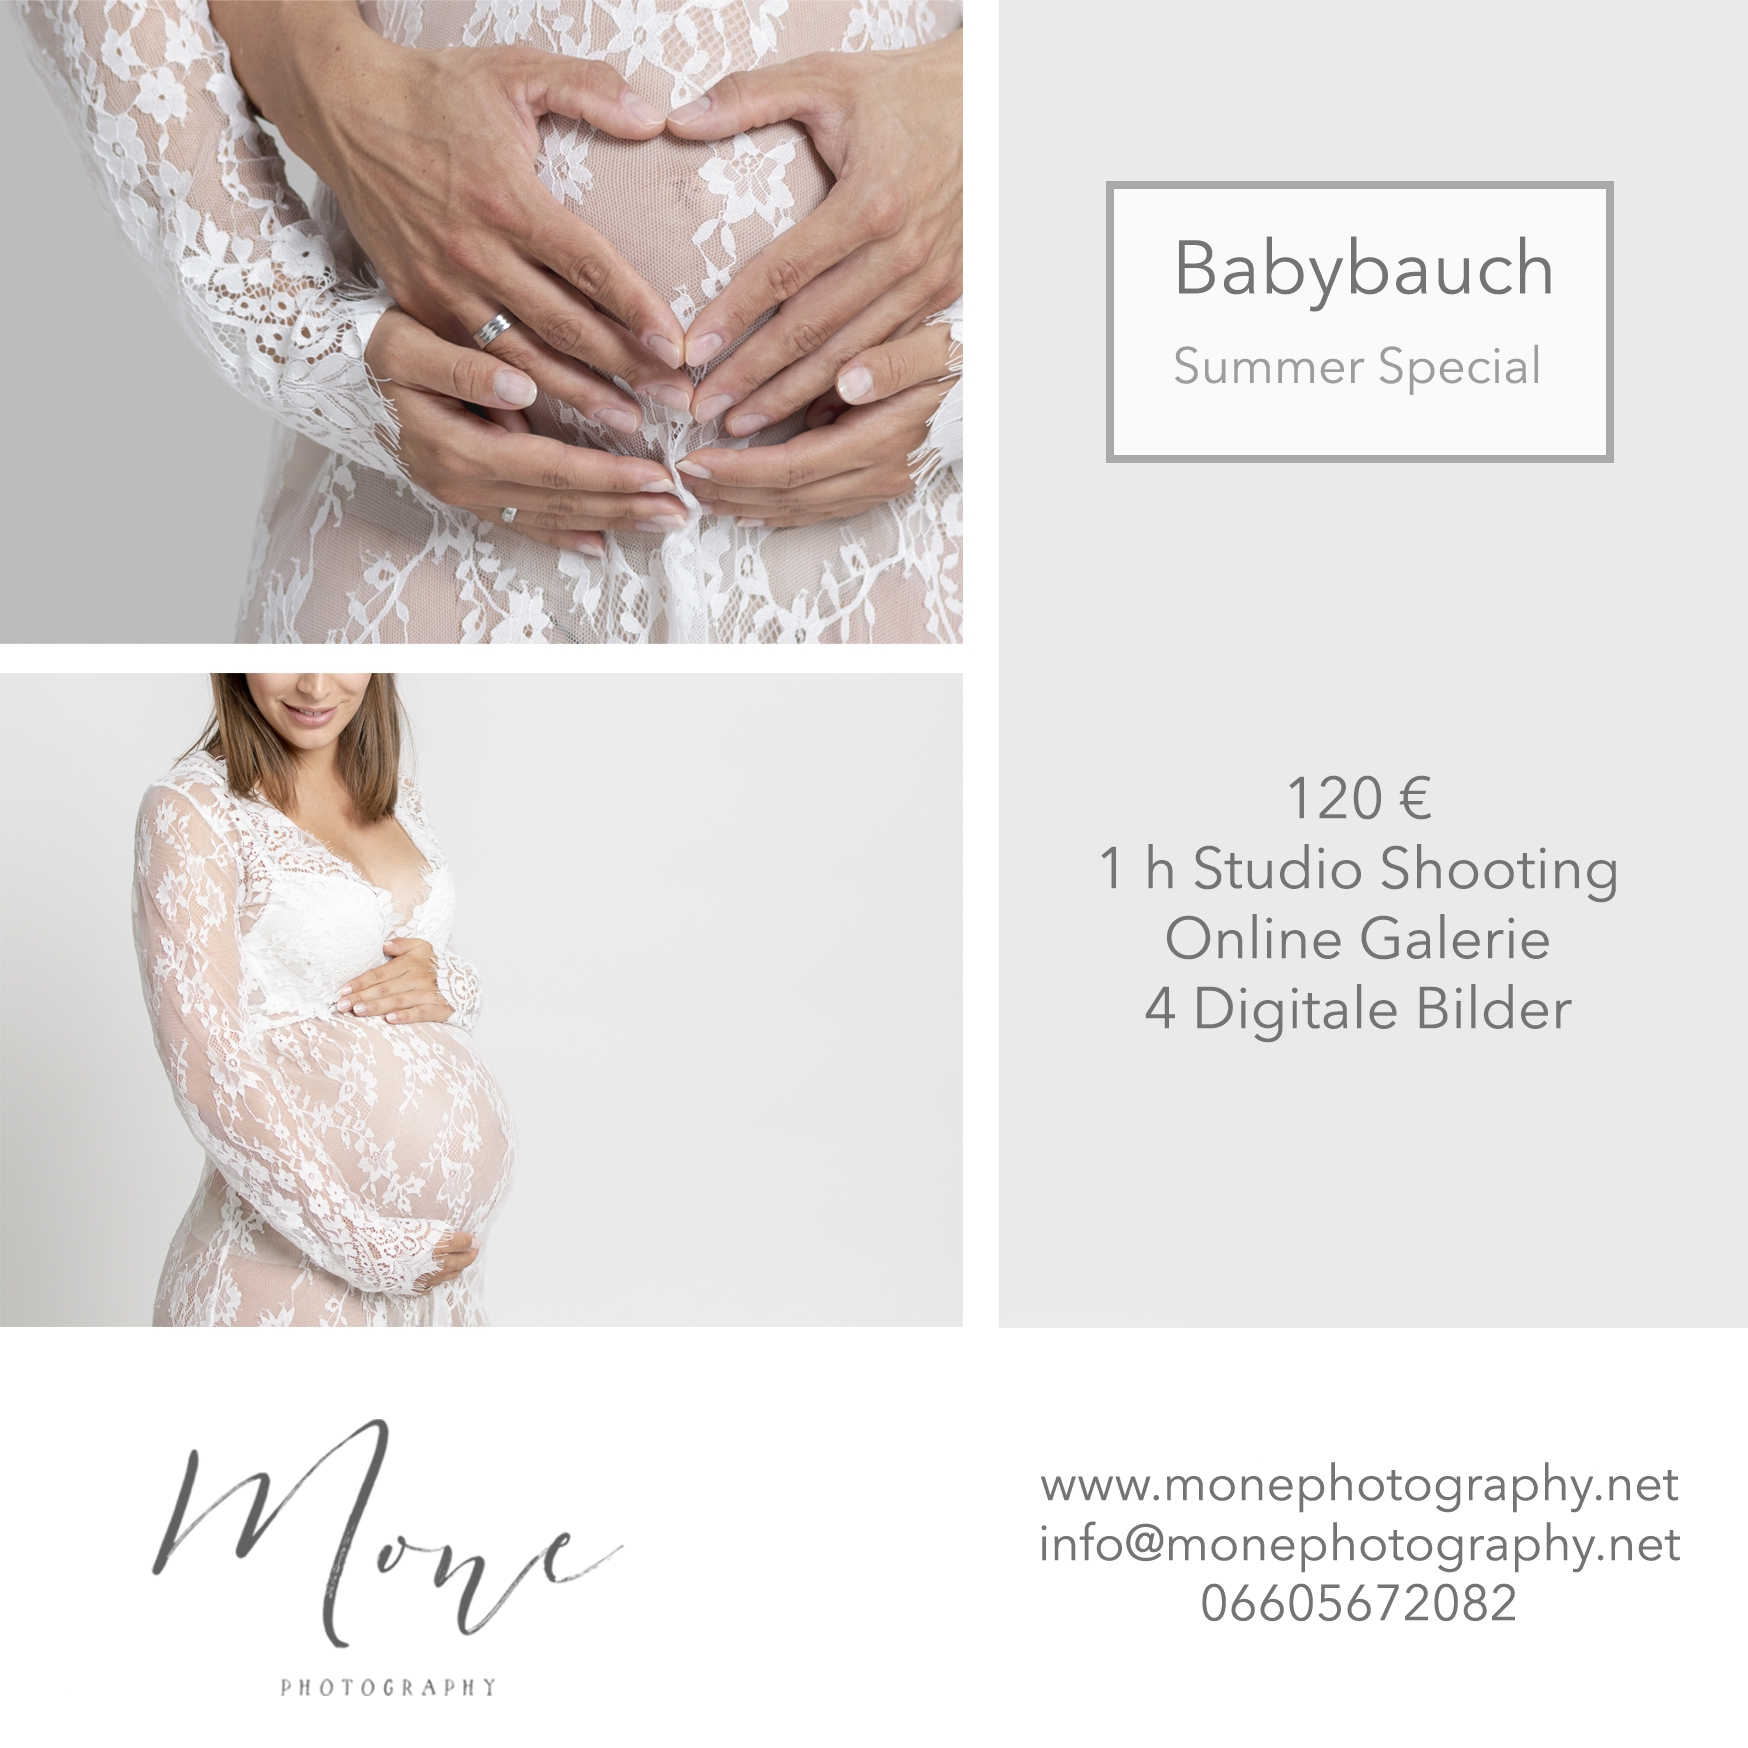 BabybauchMarketingnew.jpg